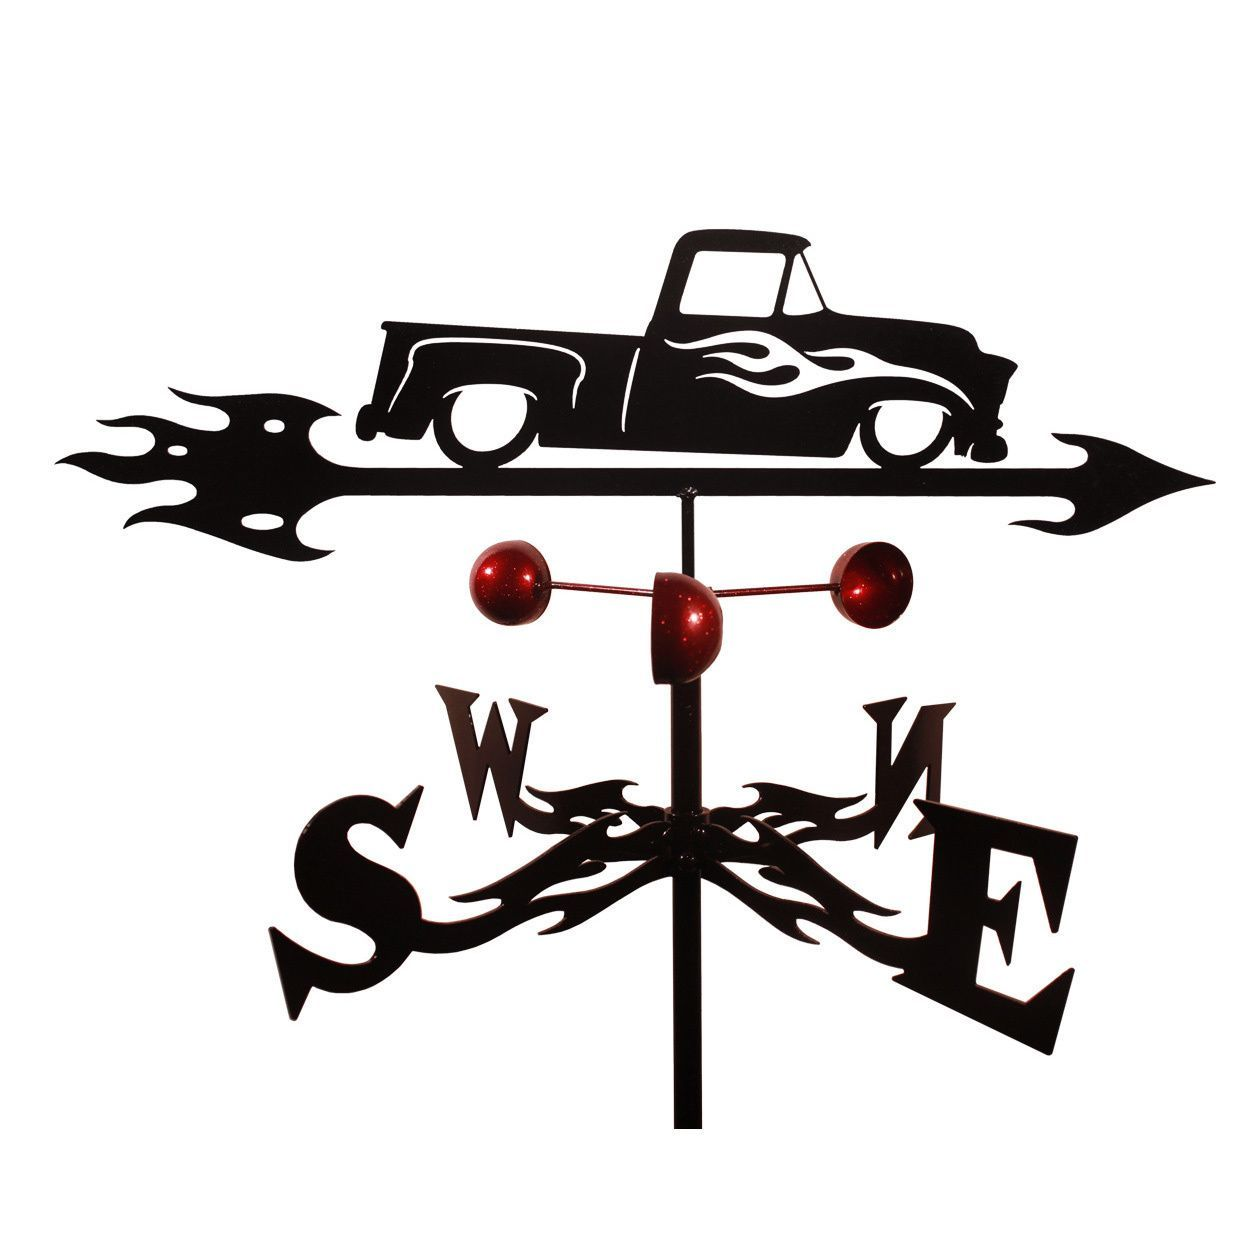 Handmade Chevy Truck Auto Car Steel Weathervane Roof